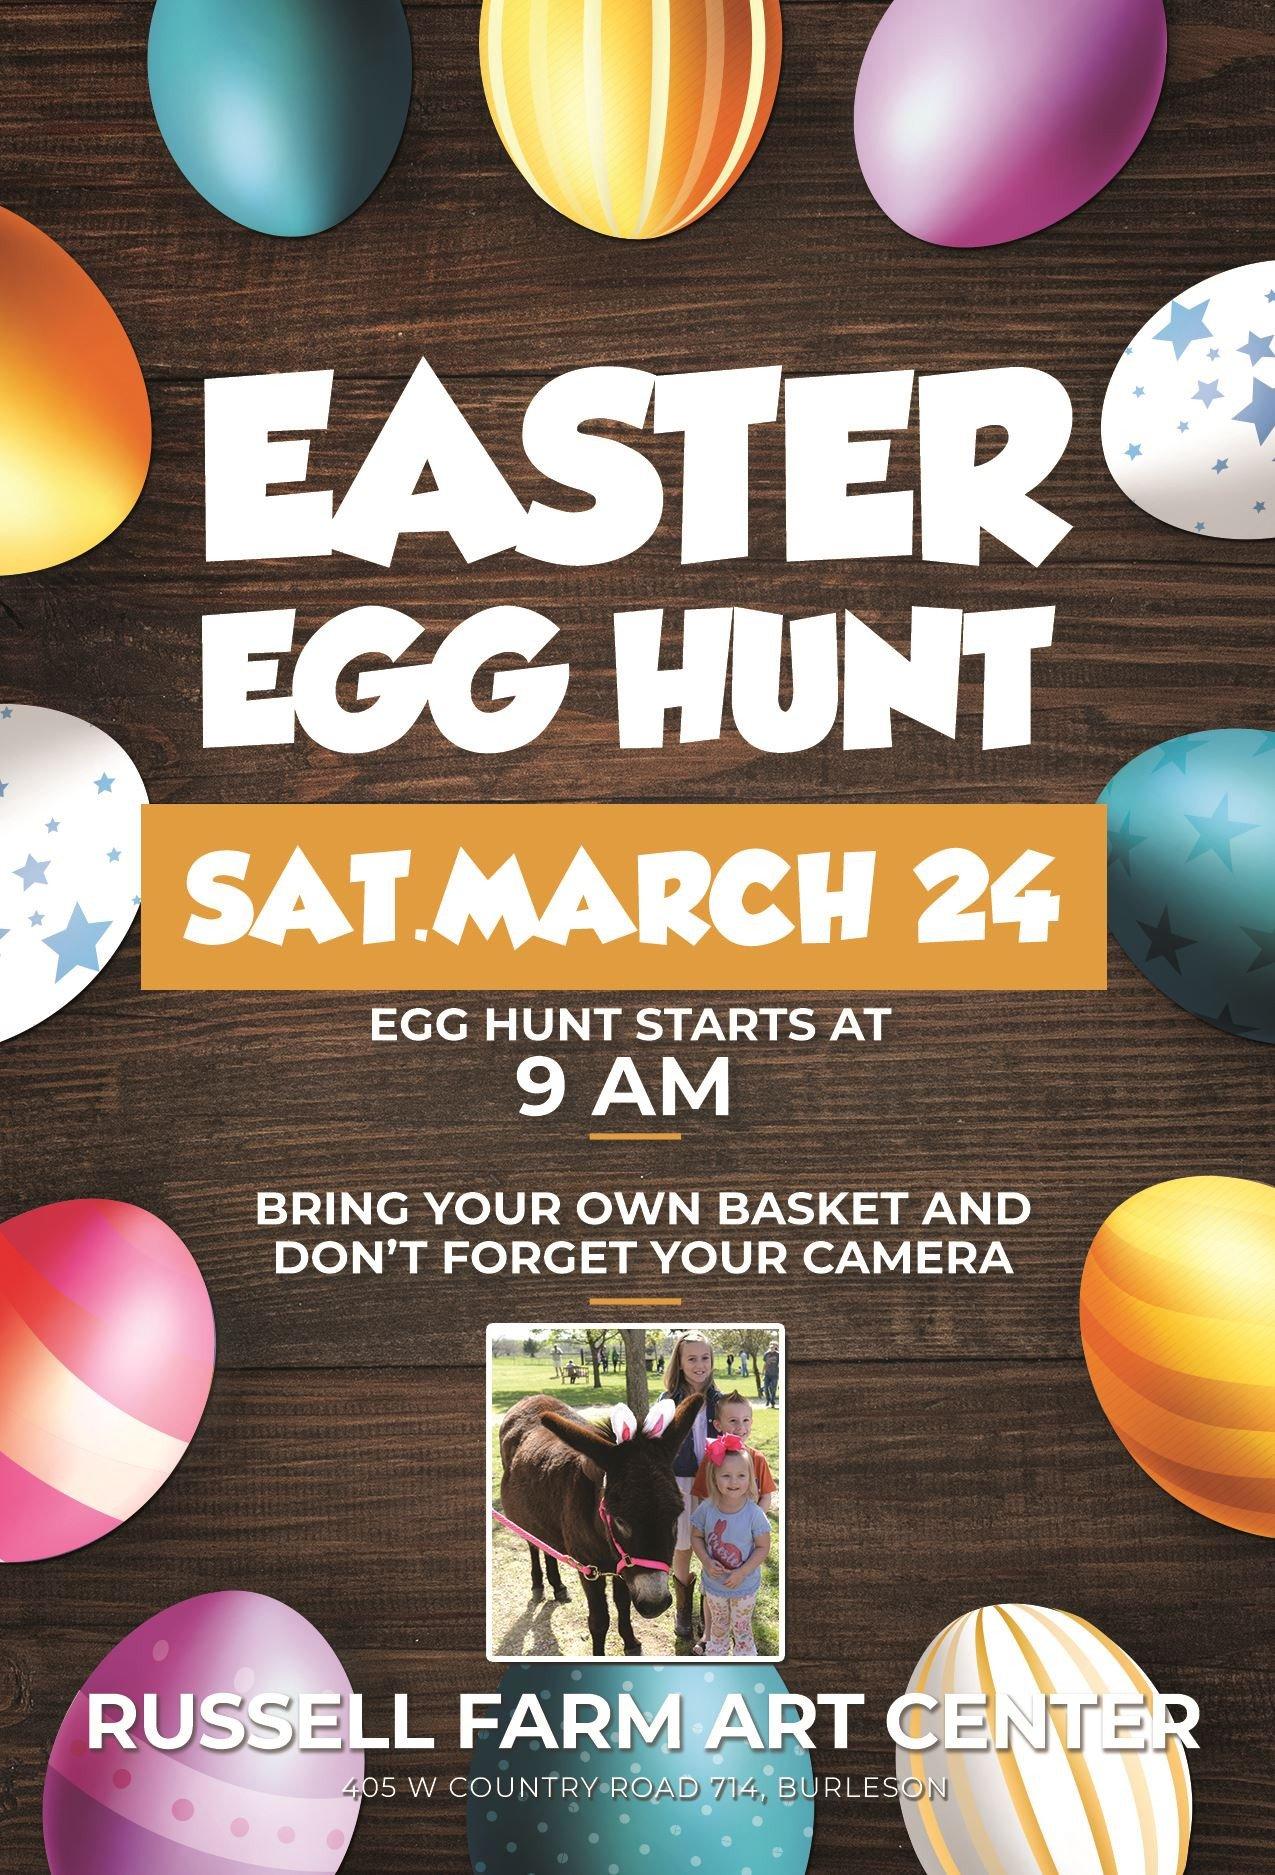 Easter Egg Hunt Flyer Easter Egg Hunt at Russell Farm